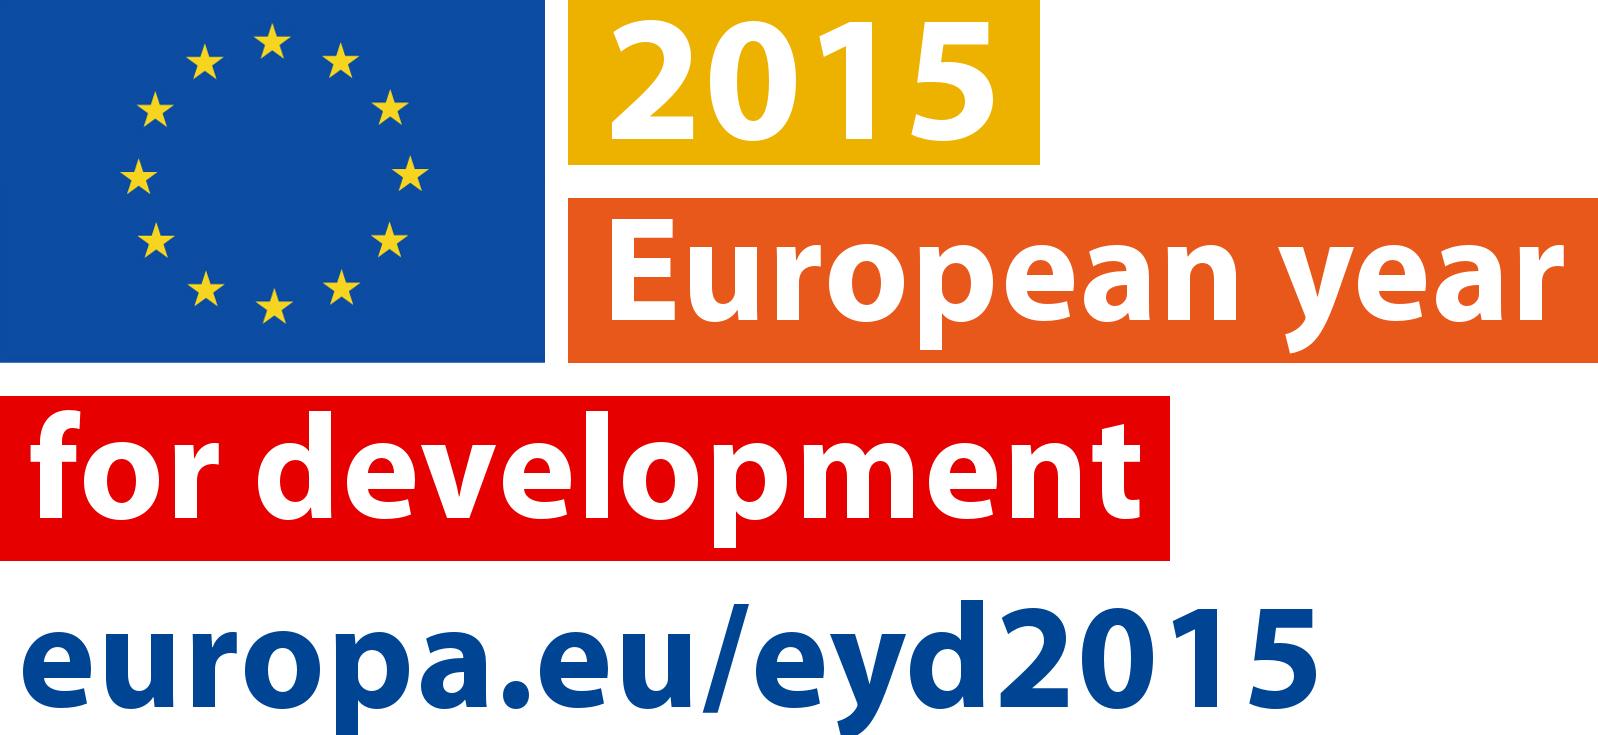 2015-european-year